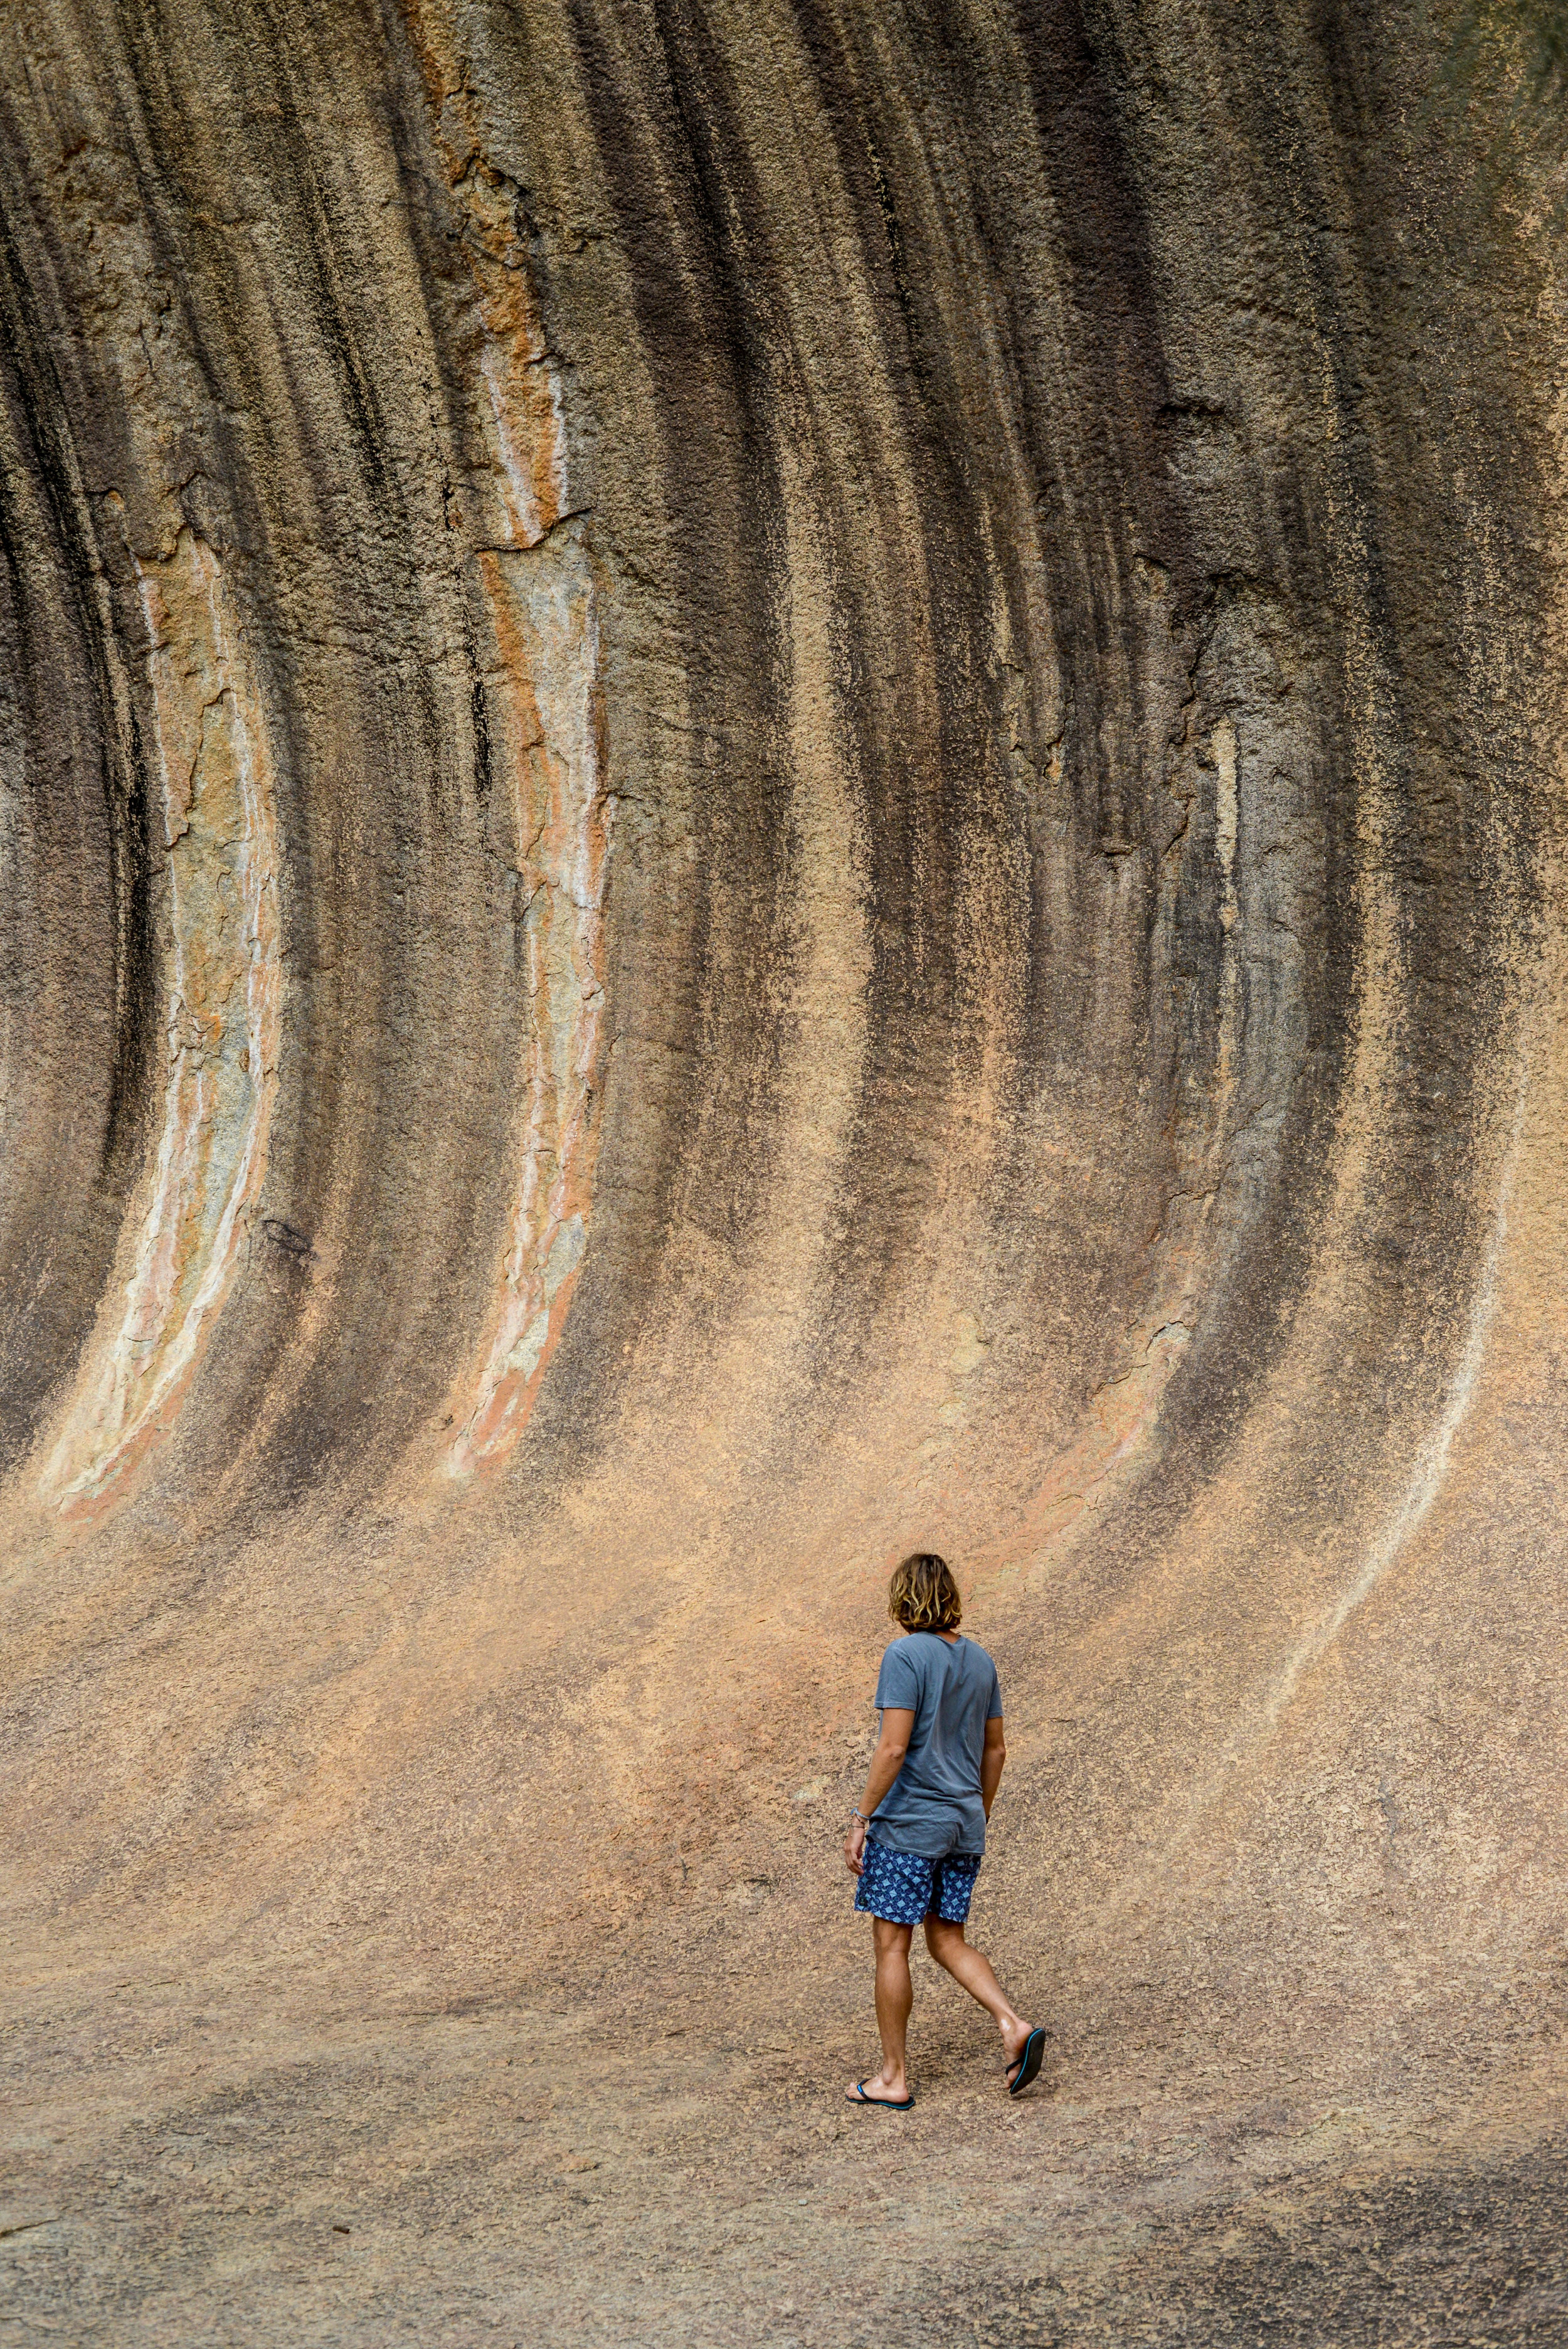 Beneath Wave Rock in Western Australia.